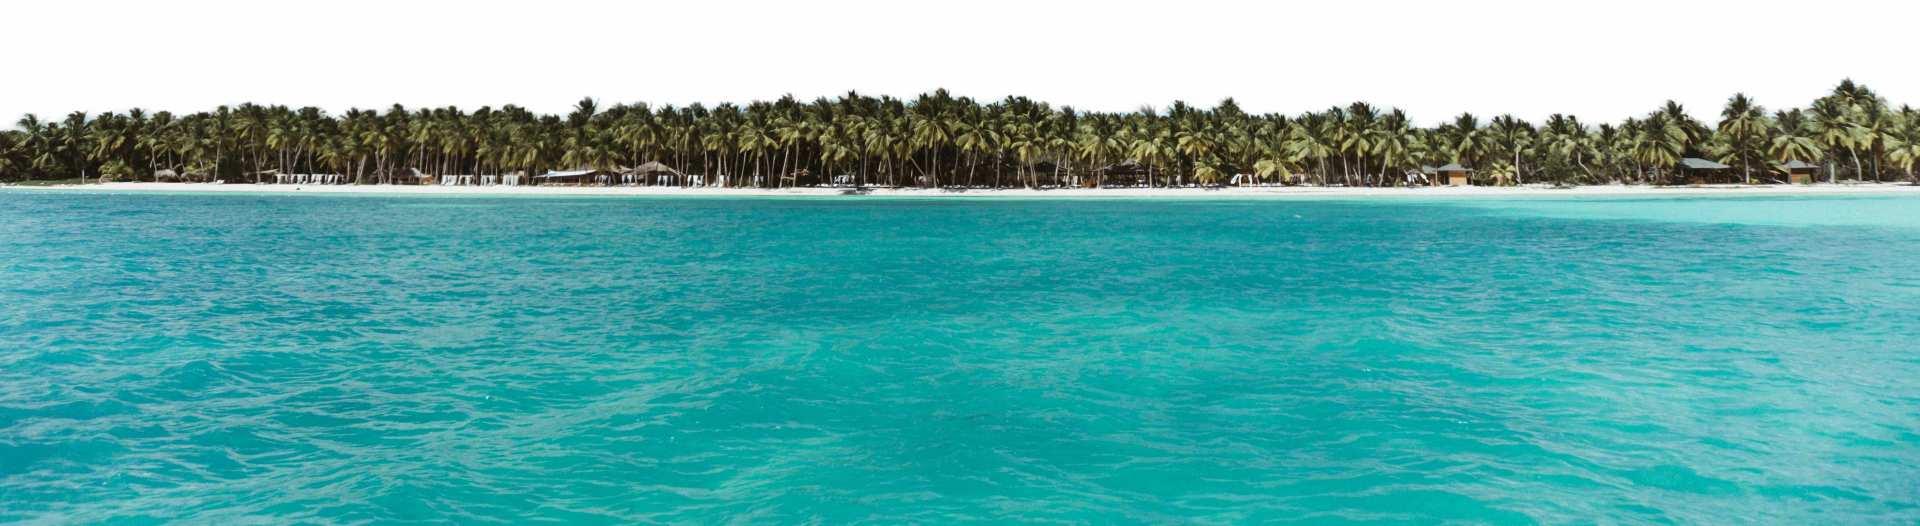 Custom-Travel-Planner-Network-Caribbean-Dominican-Republic-Saona-Island